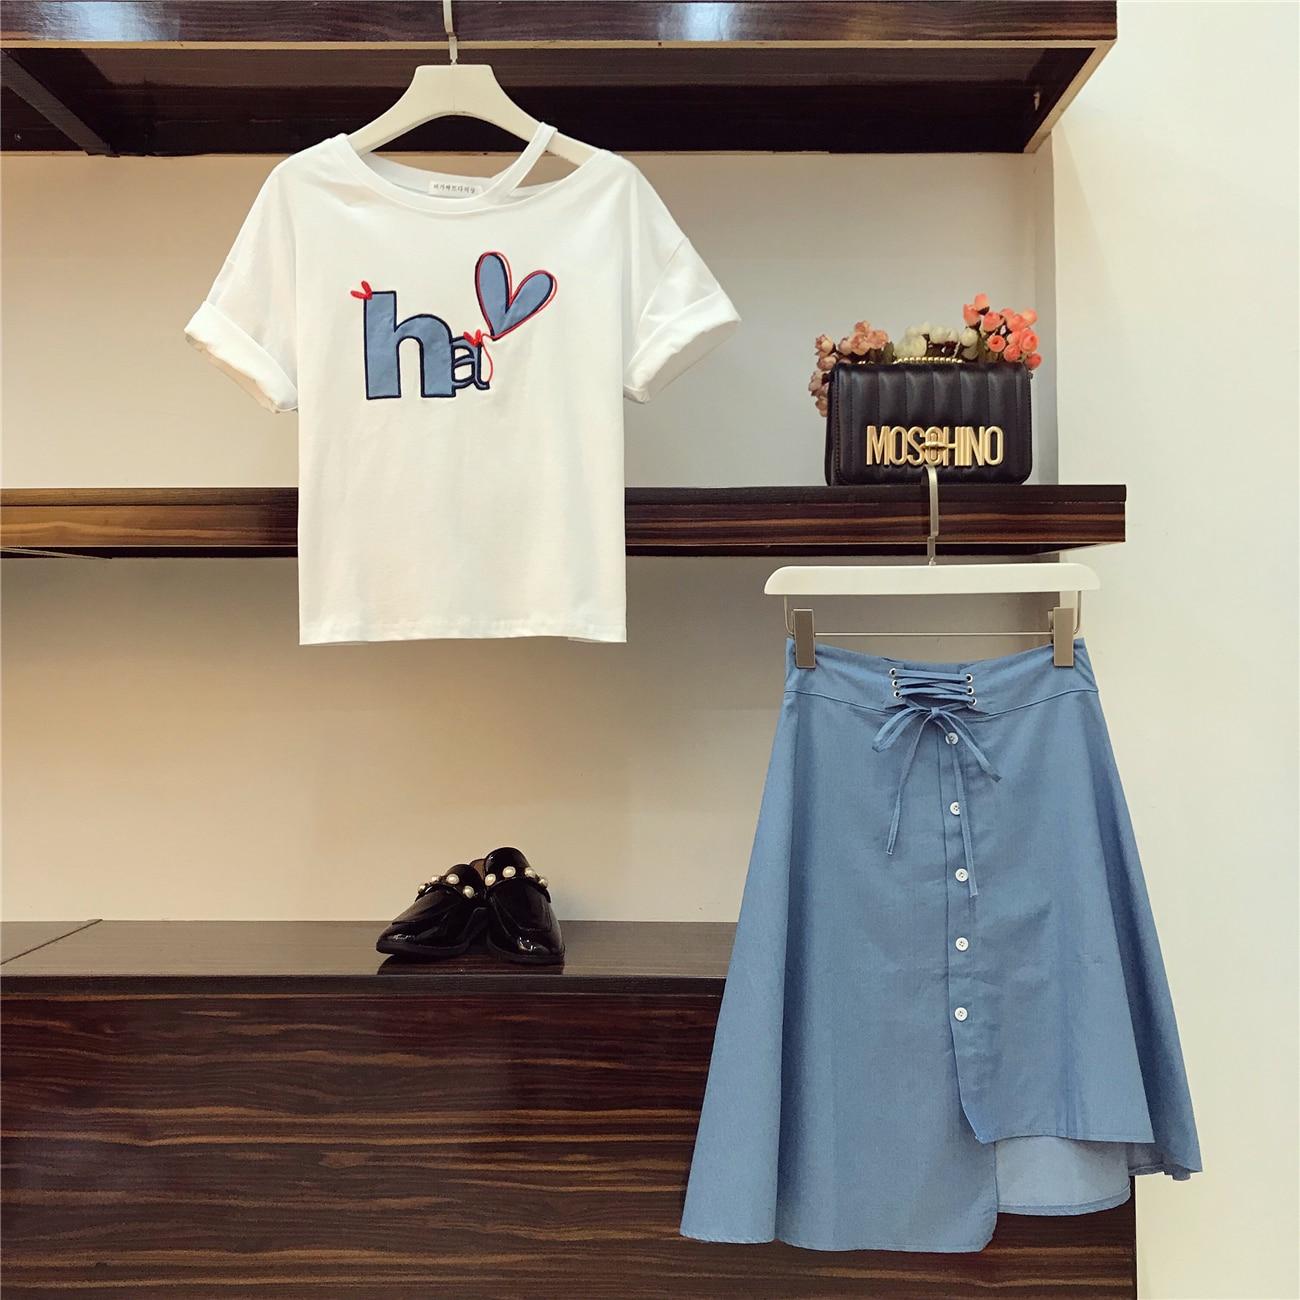 Irregular Fashion Waist Cotton Embroidery High Short Students Printing Summer Women's New Blue Suits Skirt Sleeve Sets 2018 Tshirts wEWS7OFnq